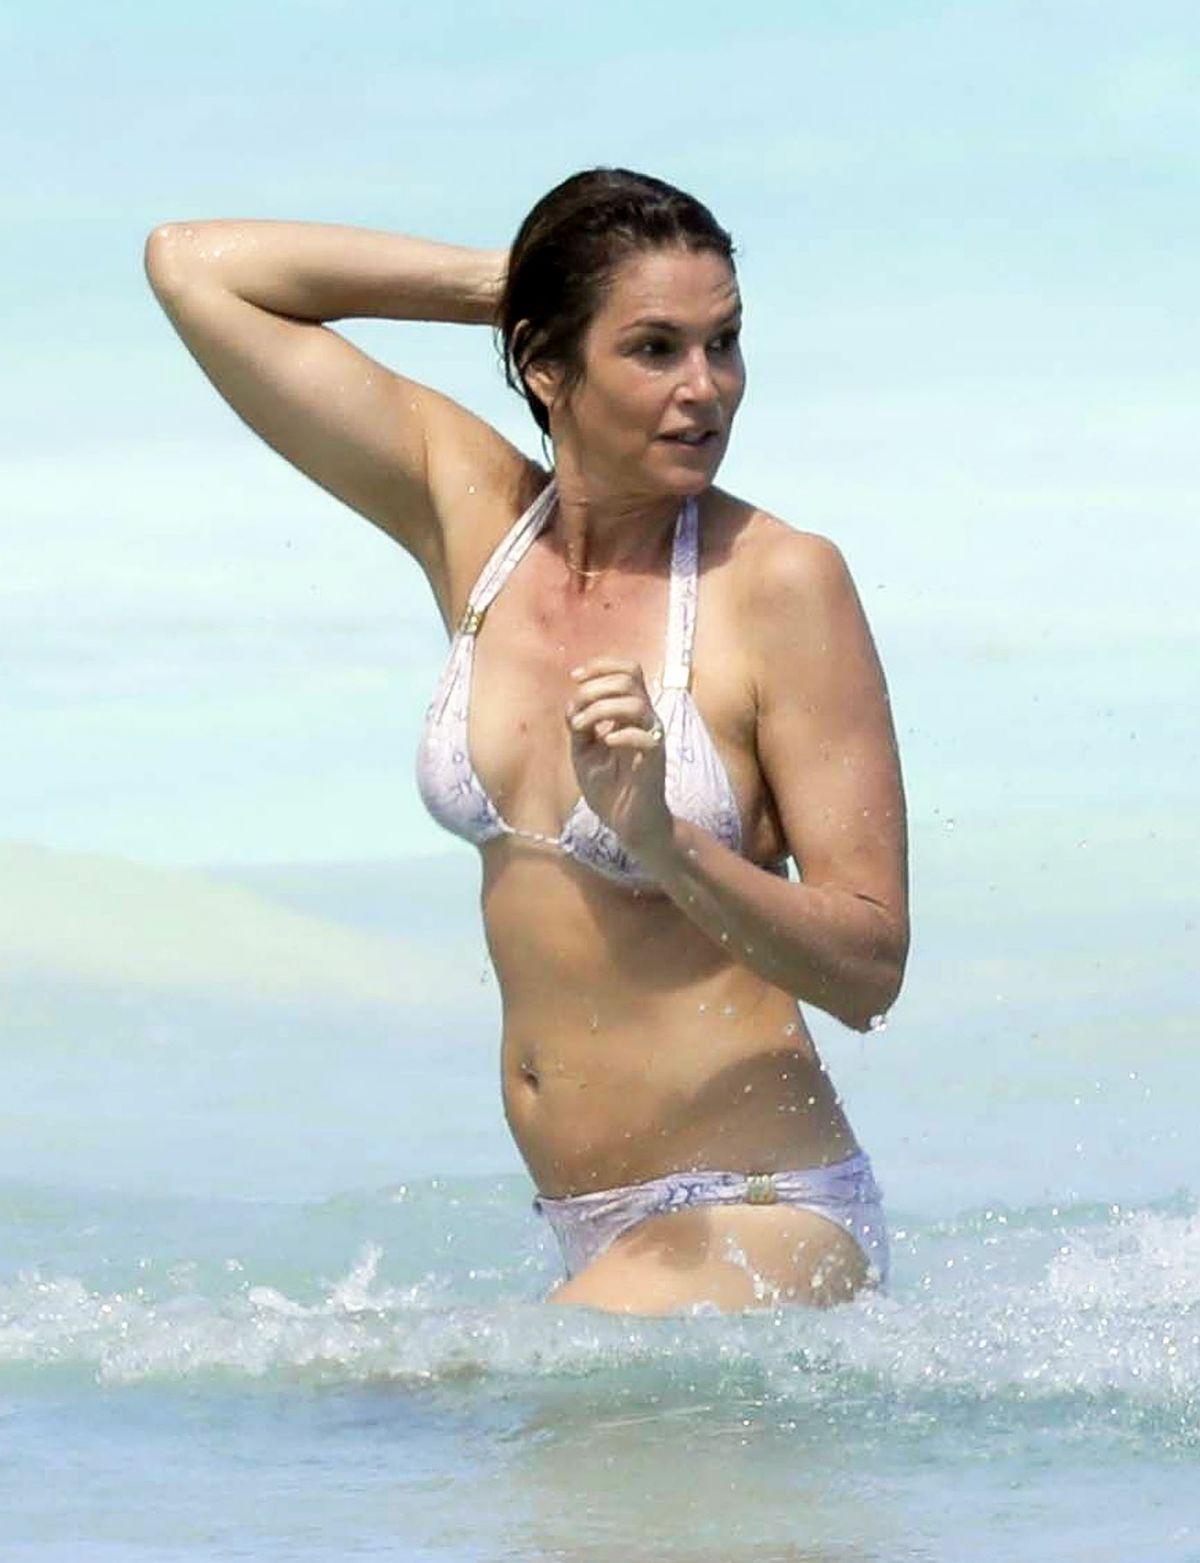 Cindy crawford in bikini at the beach